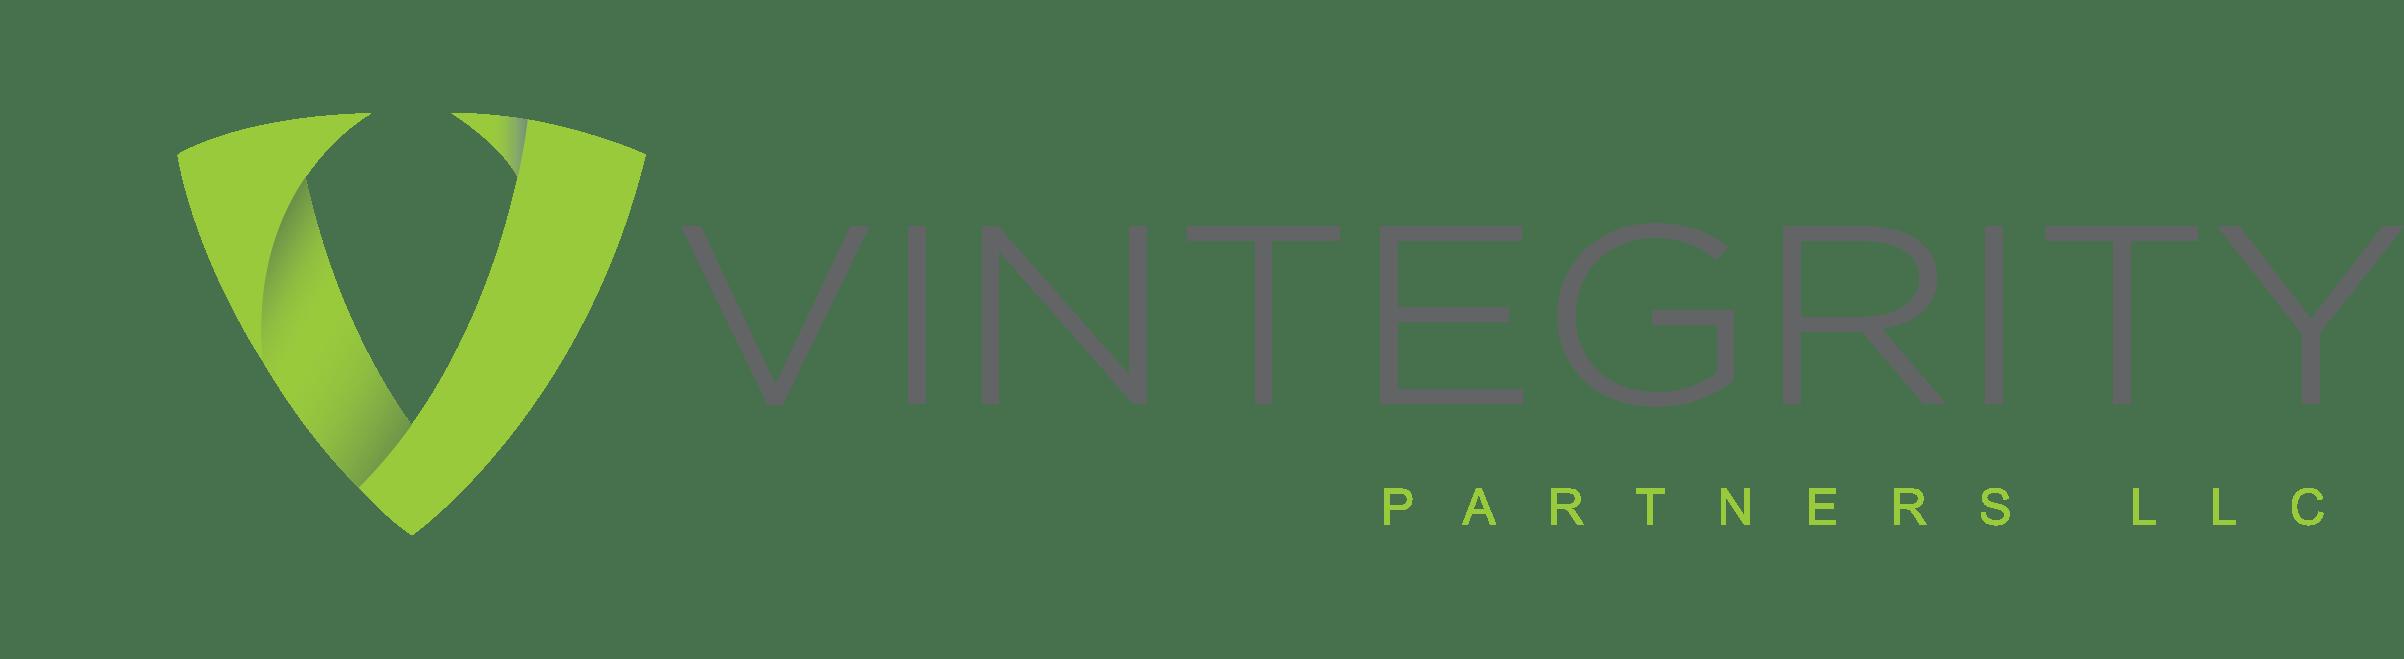 Vintegrity Partners – Workforce Optimization & Management